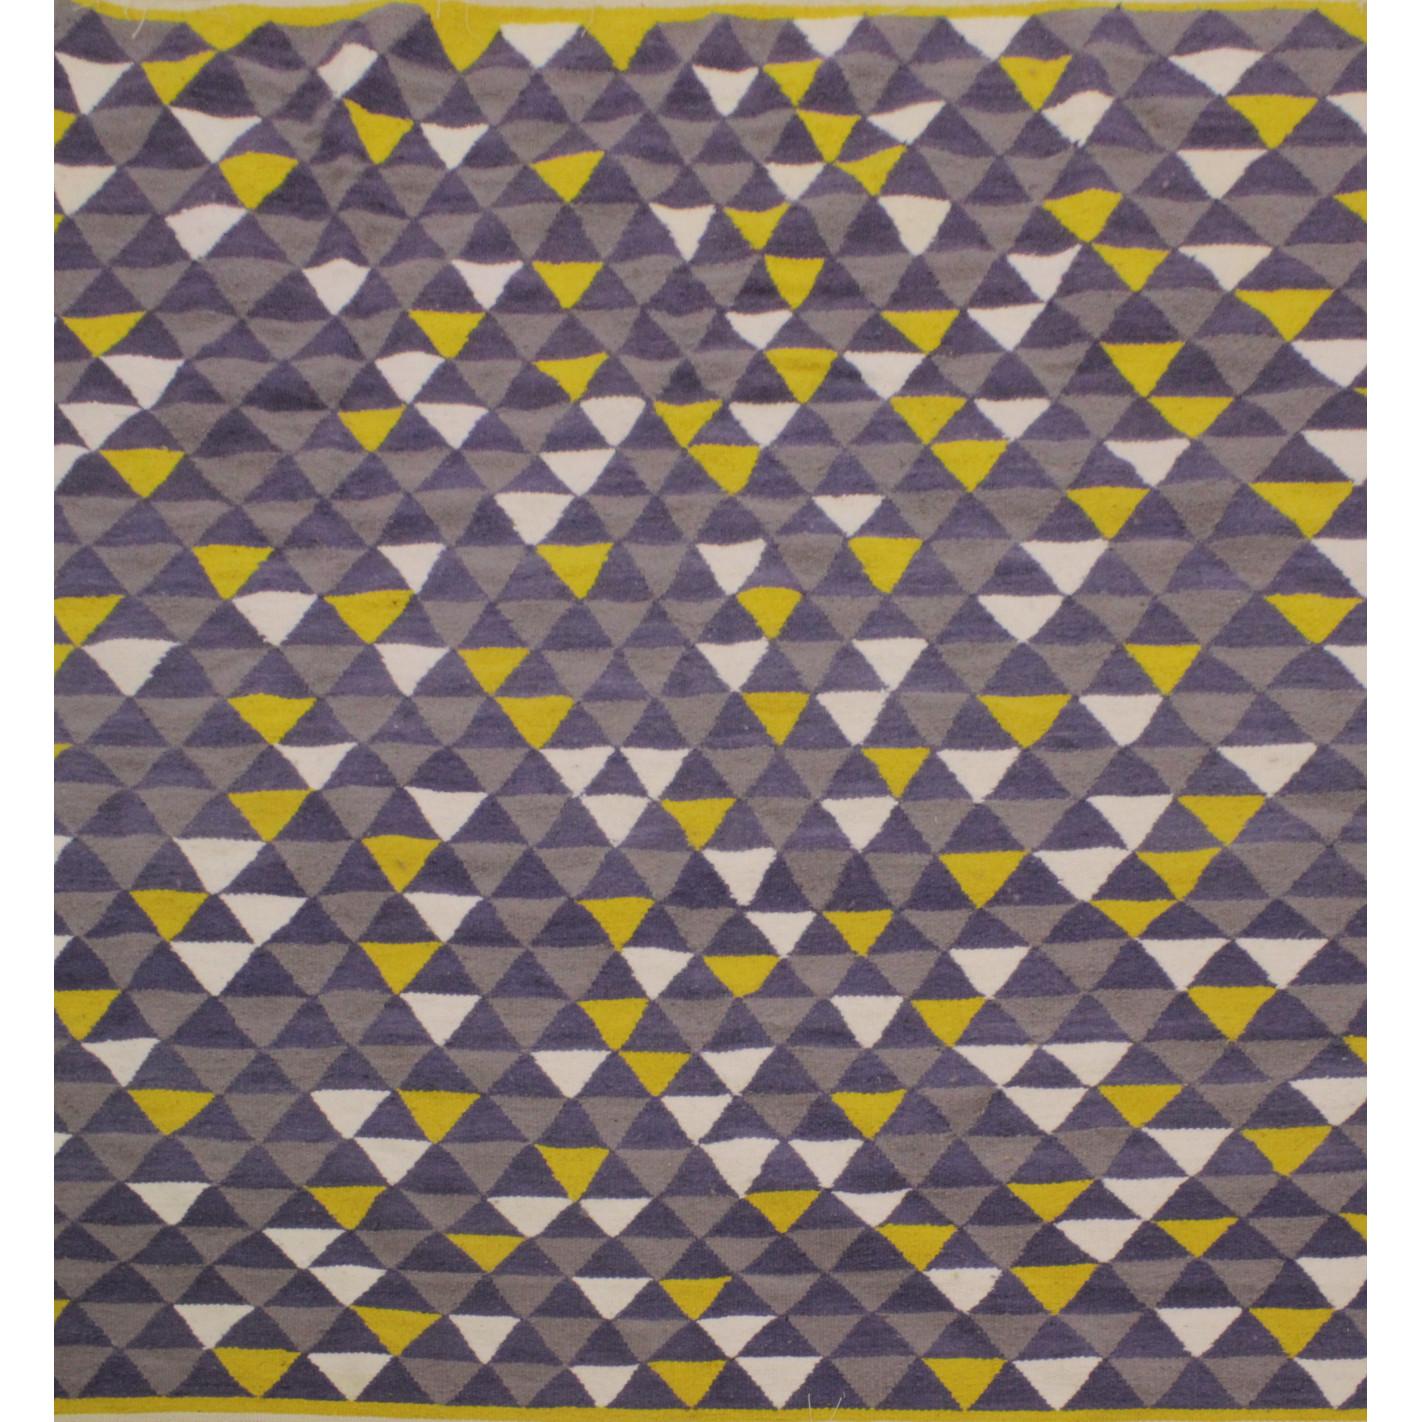 Tapis scandinave motifs triangles gris et jaune - Motif scandinave a imprimer ...